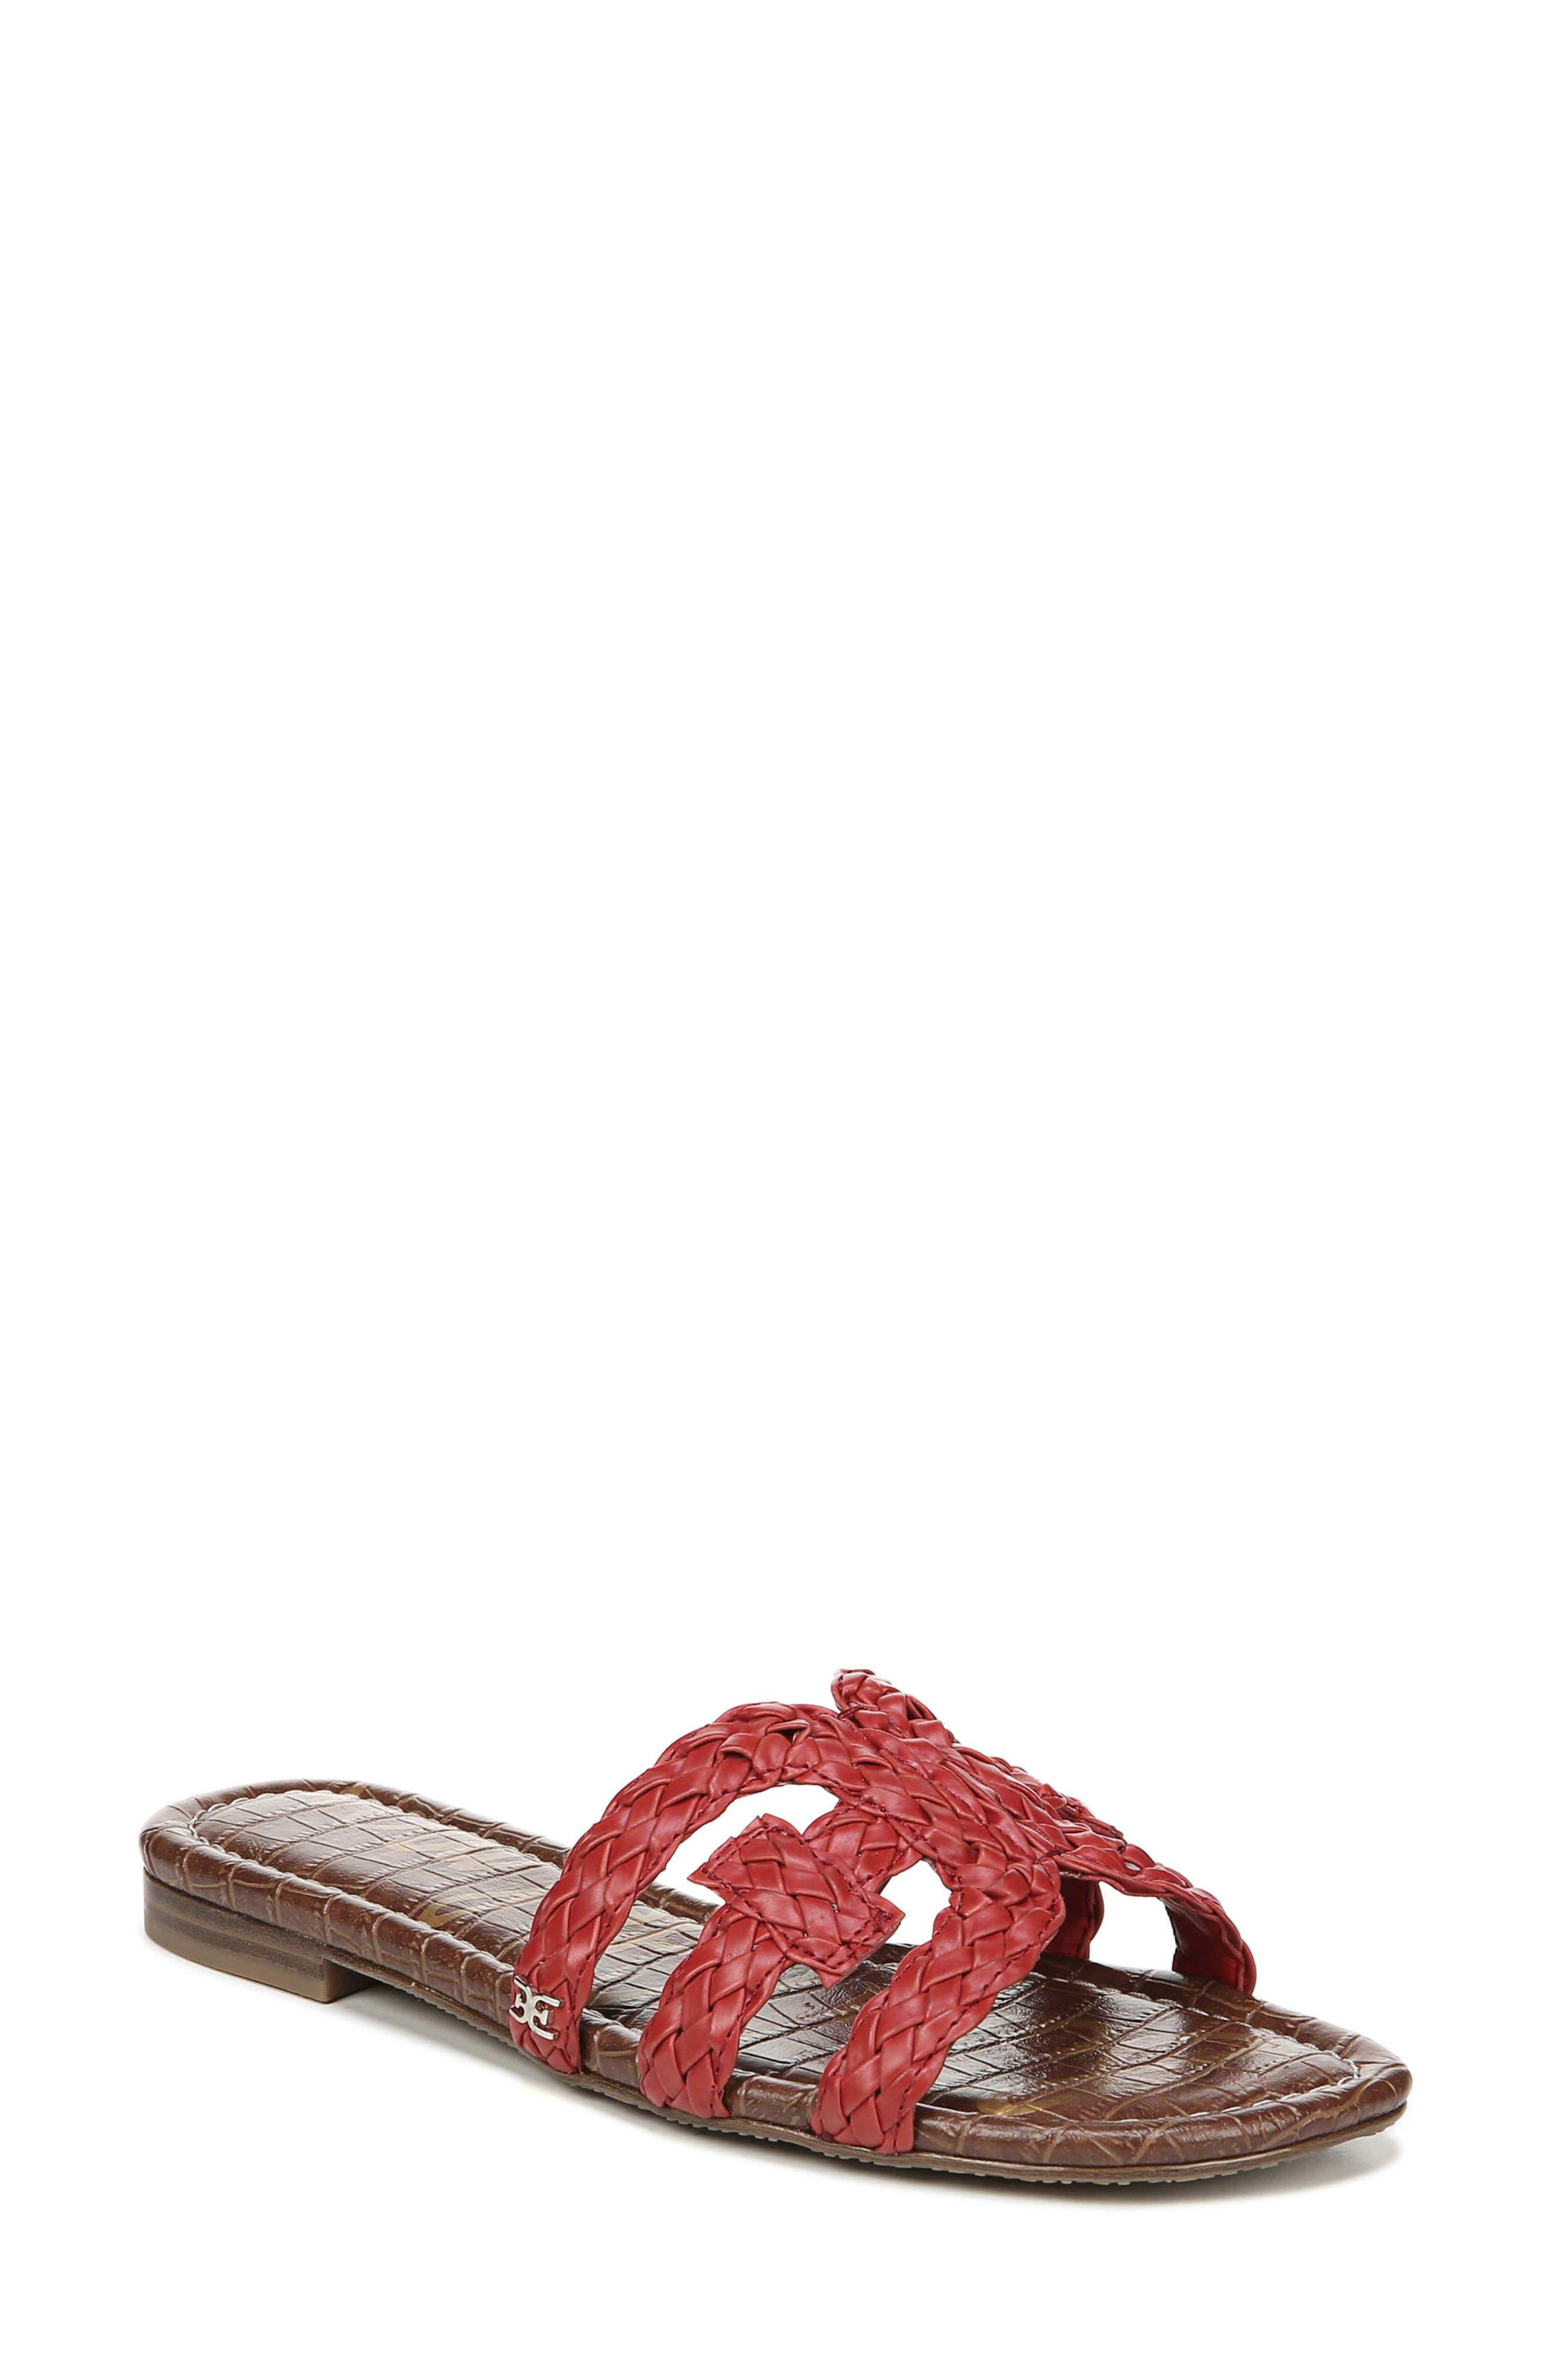 Sam Edelman Beckie Slide Sandal, Red